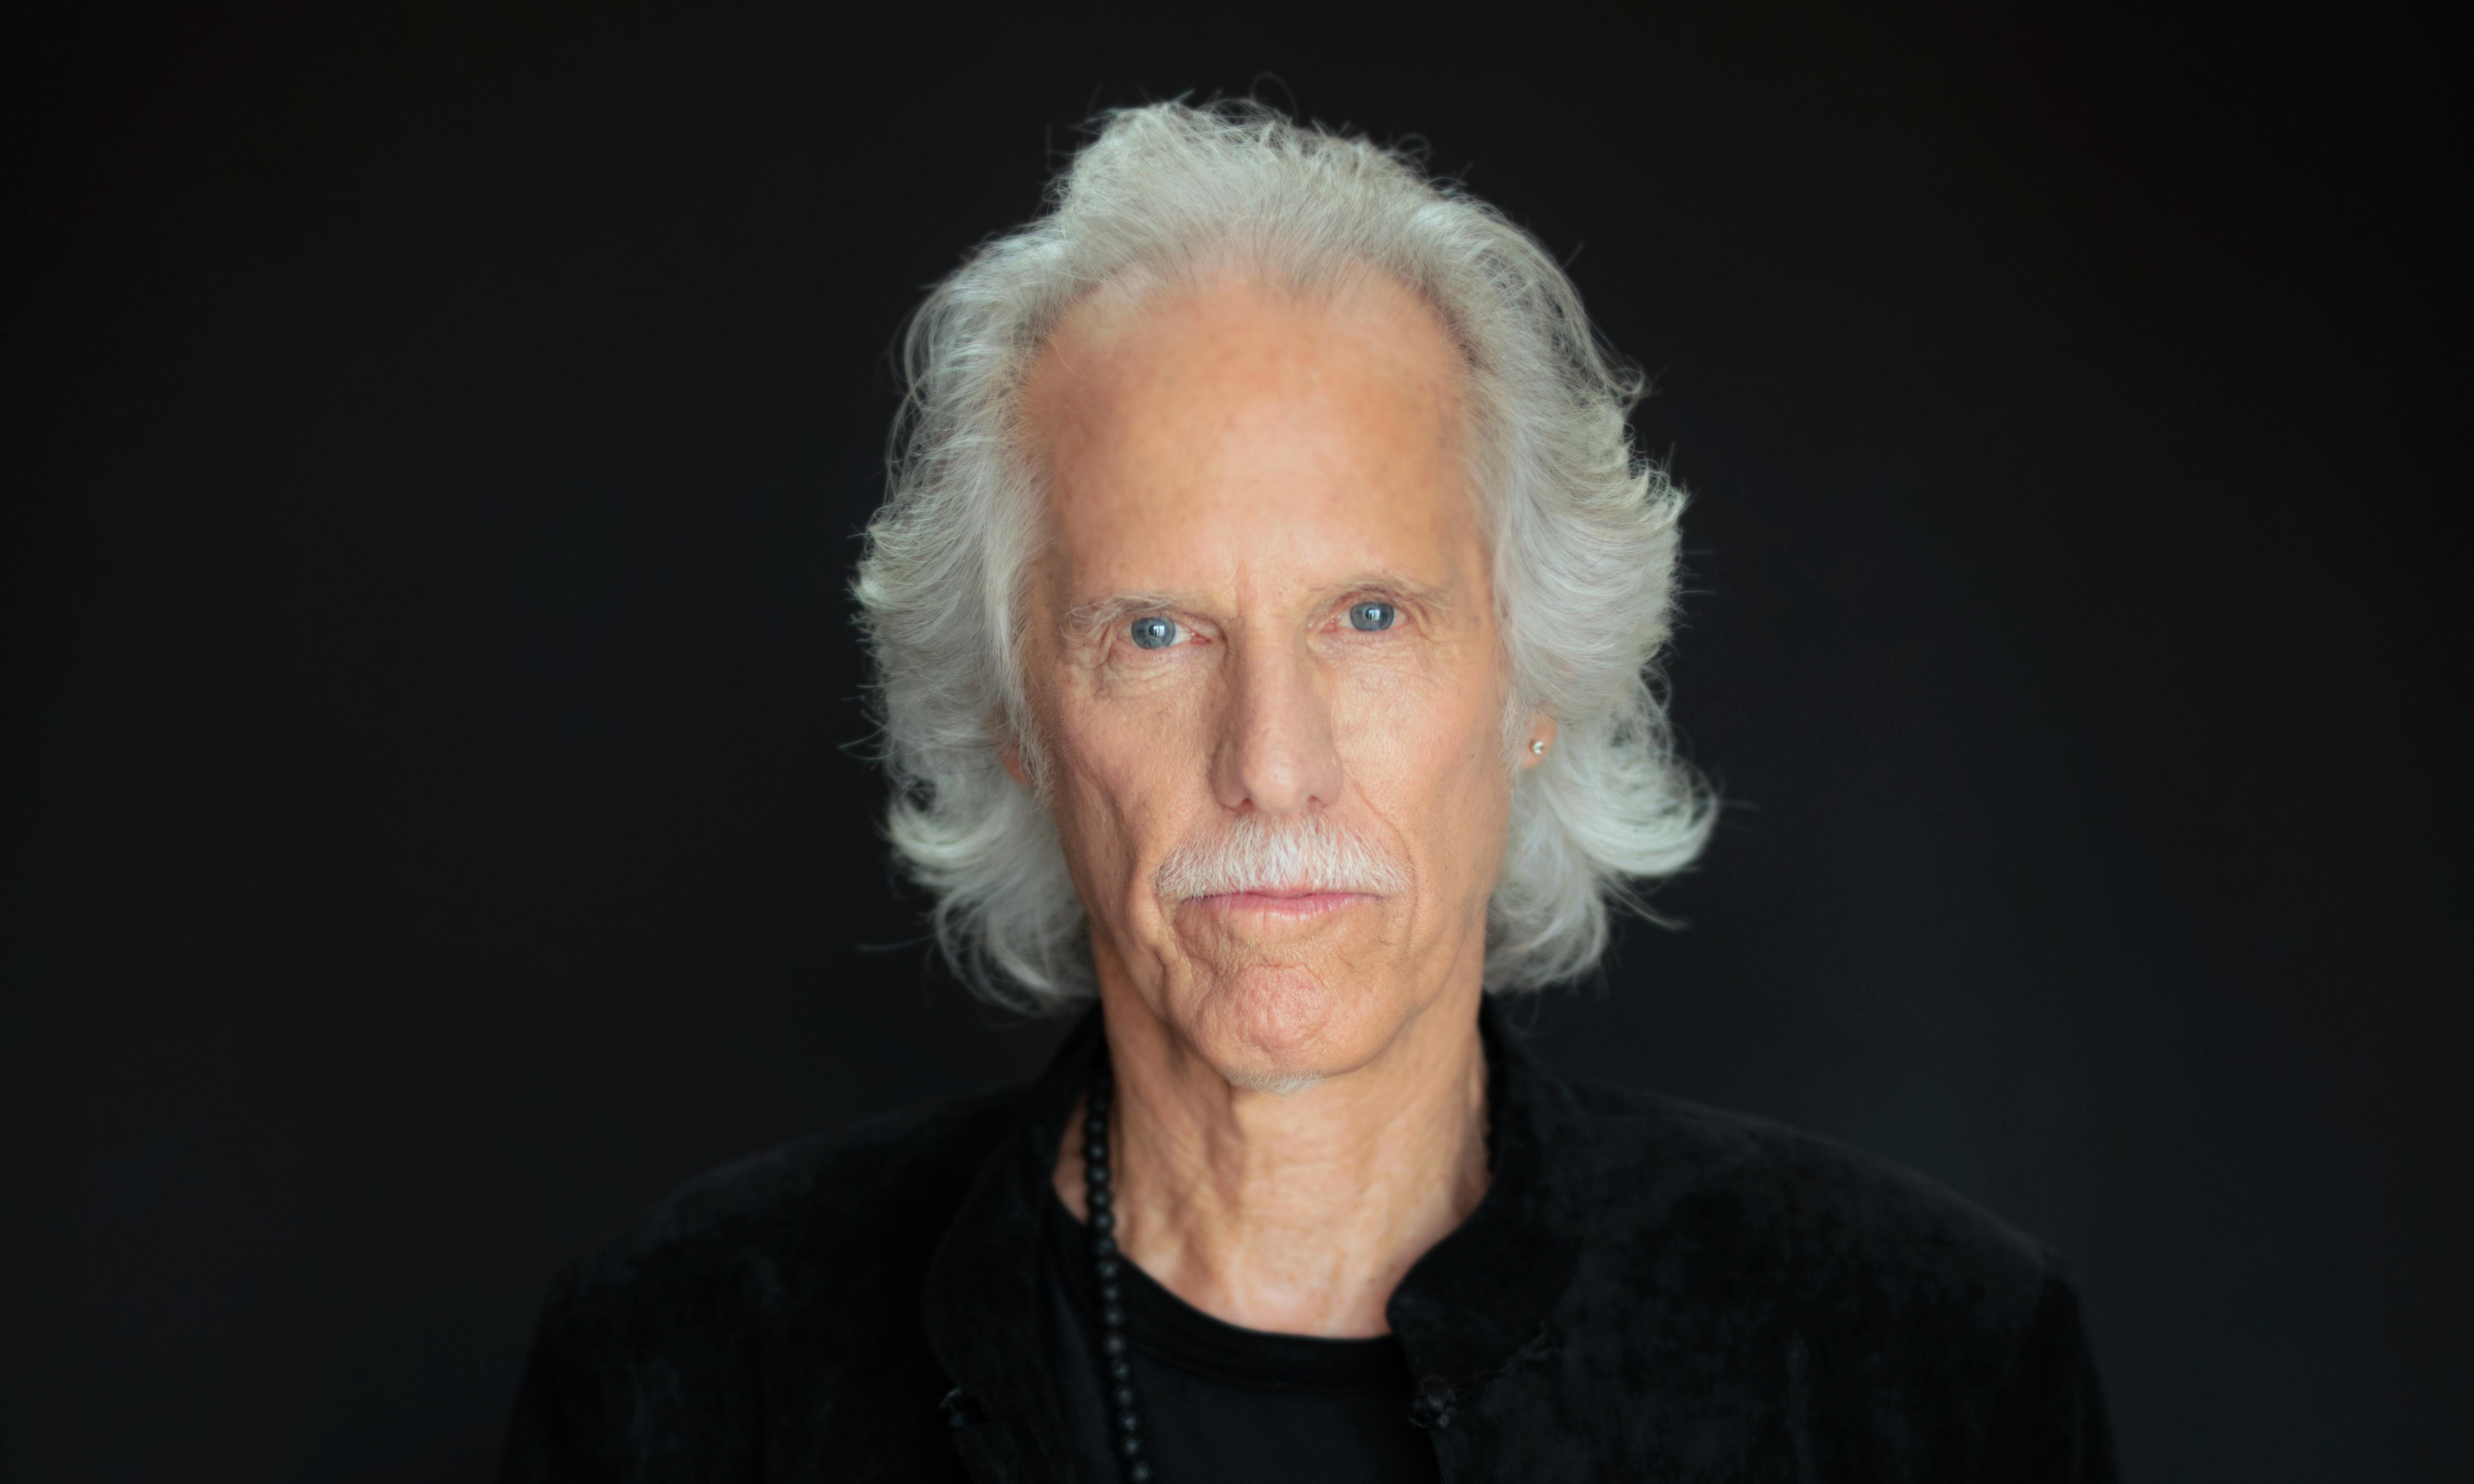 Doors drummer John Densmore: 'It took me years to forgive Jim Morrison'